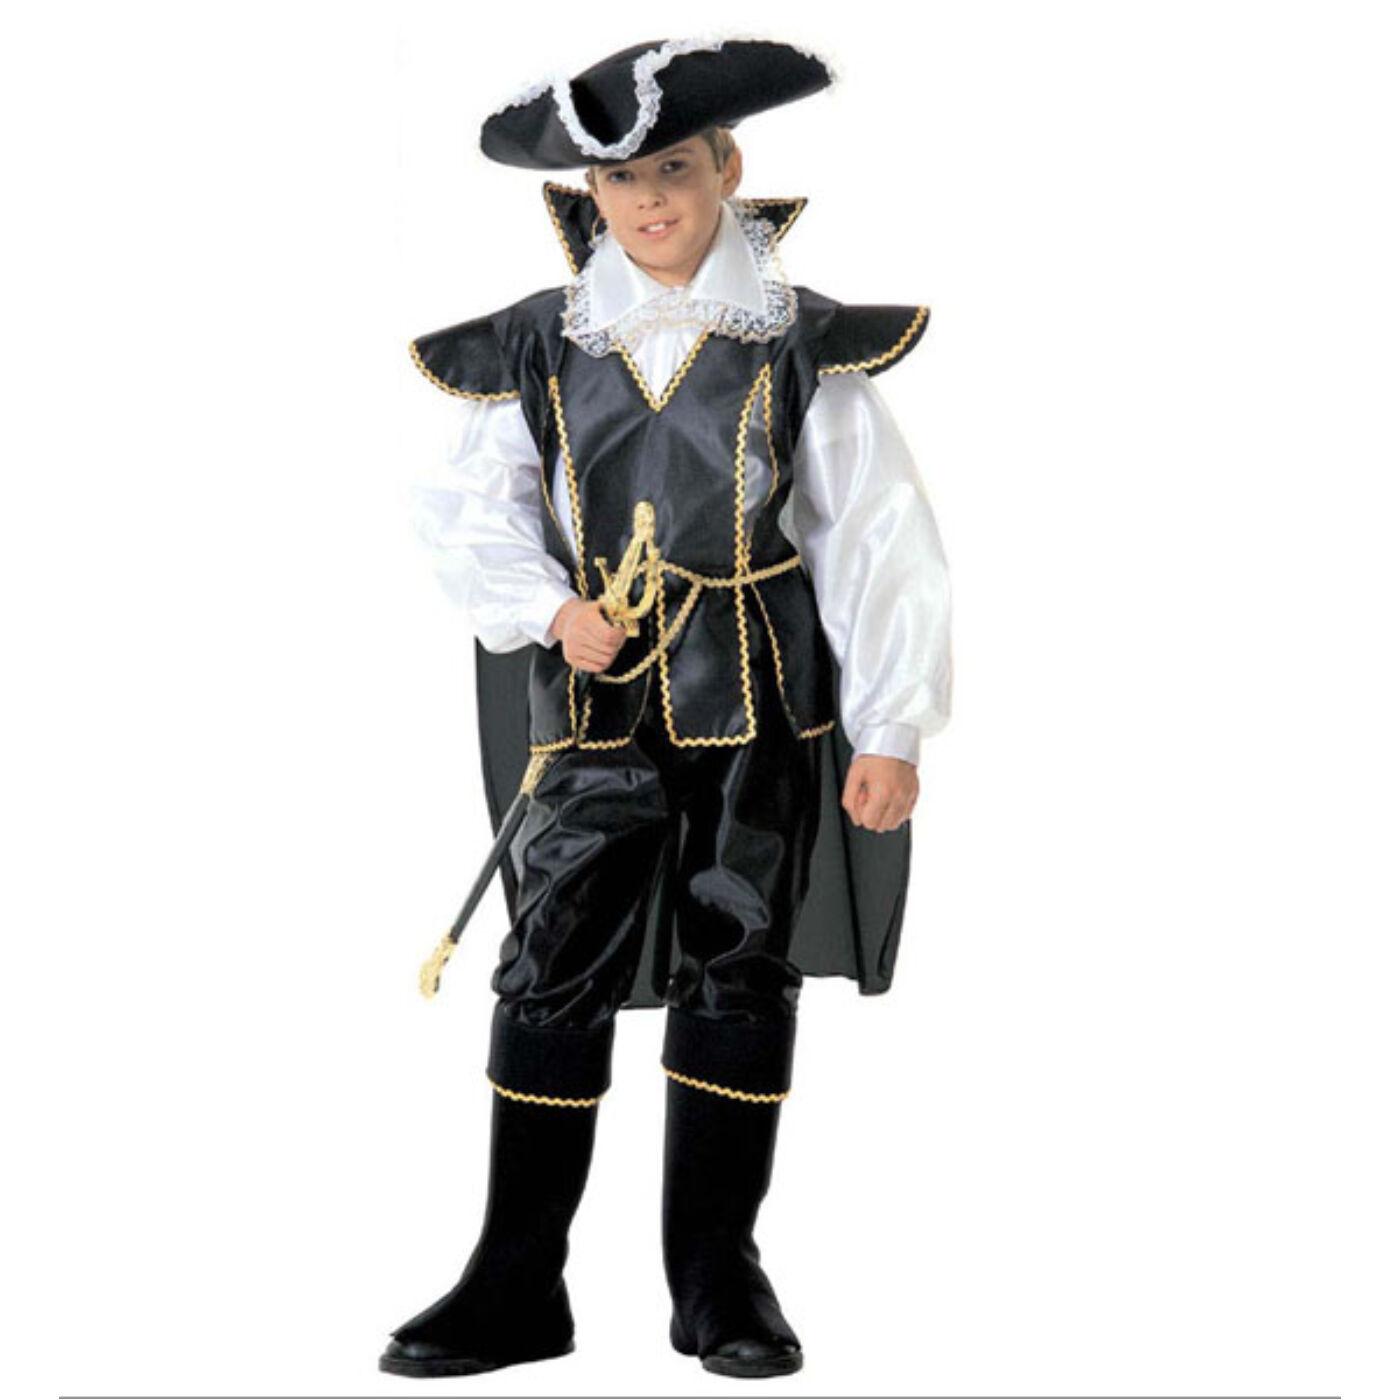 Fekete kapitány Jelmez 158-as